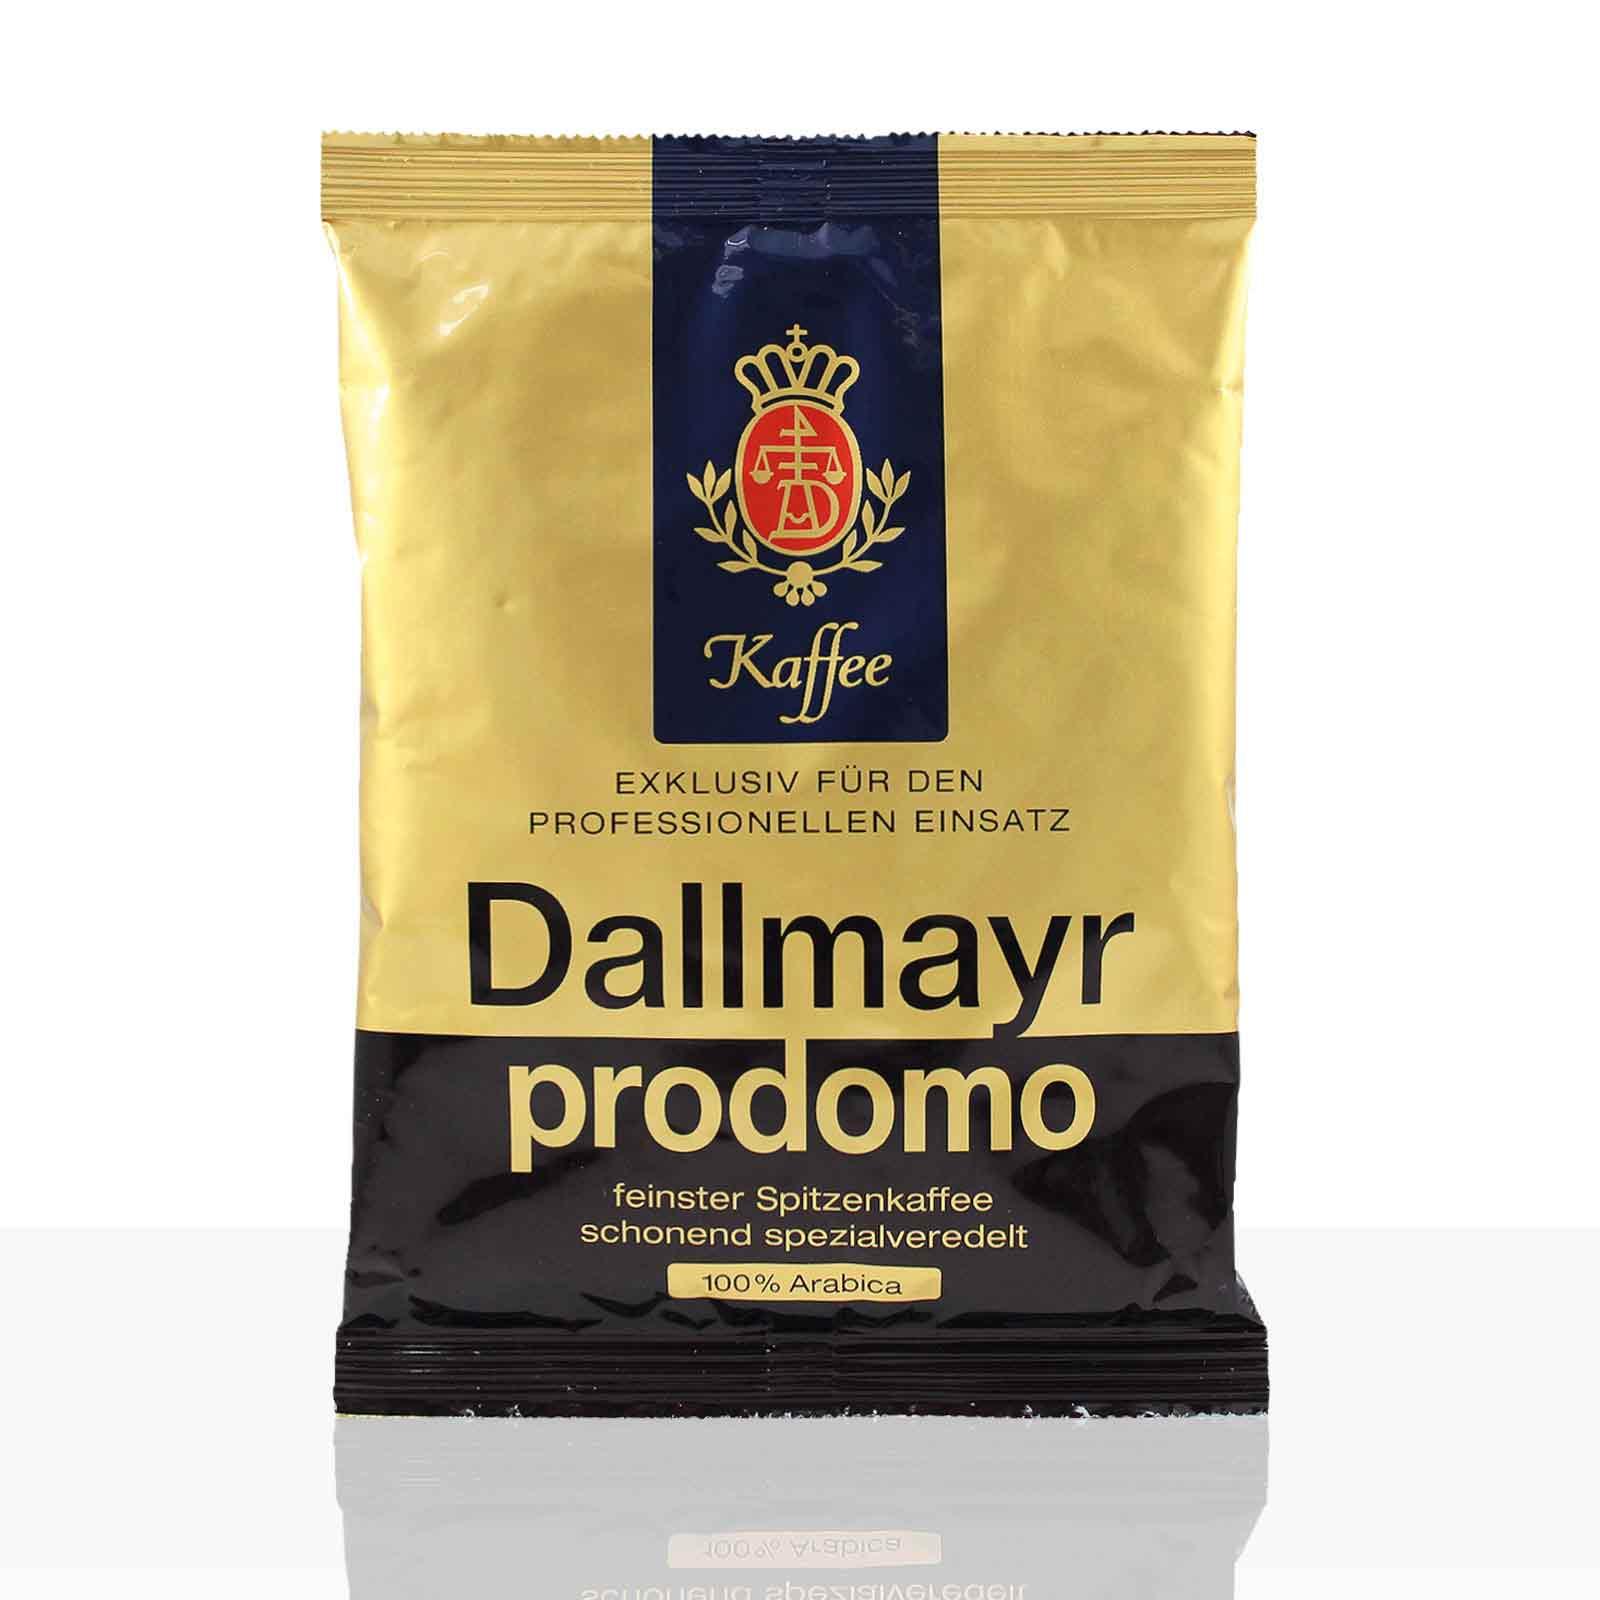 Dallmayr Prodomo - 50 x 60g Kaffee gemahlen, Filterkaffee 100% Arabica